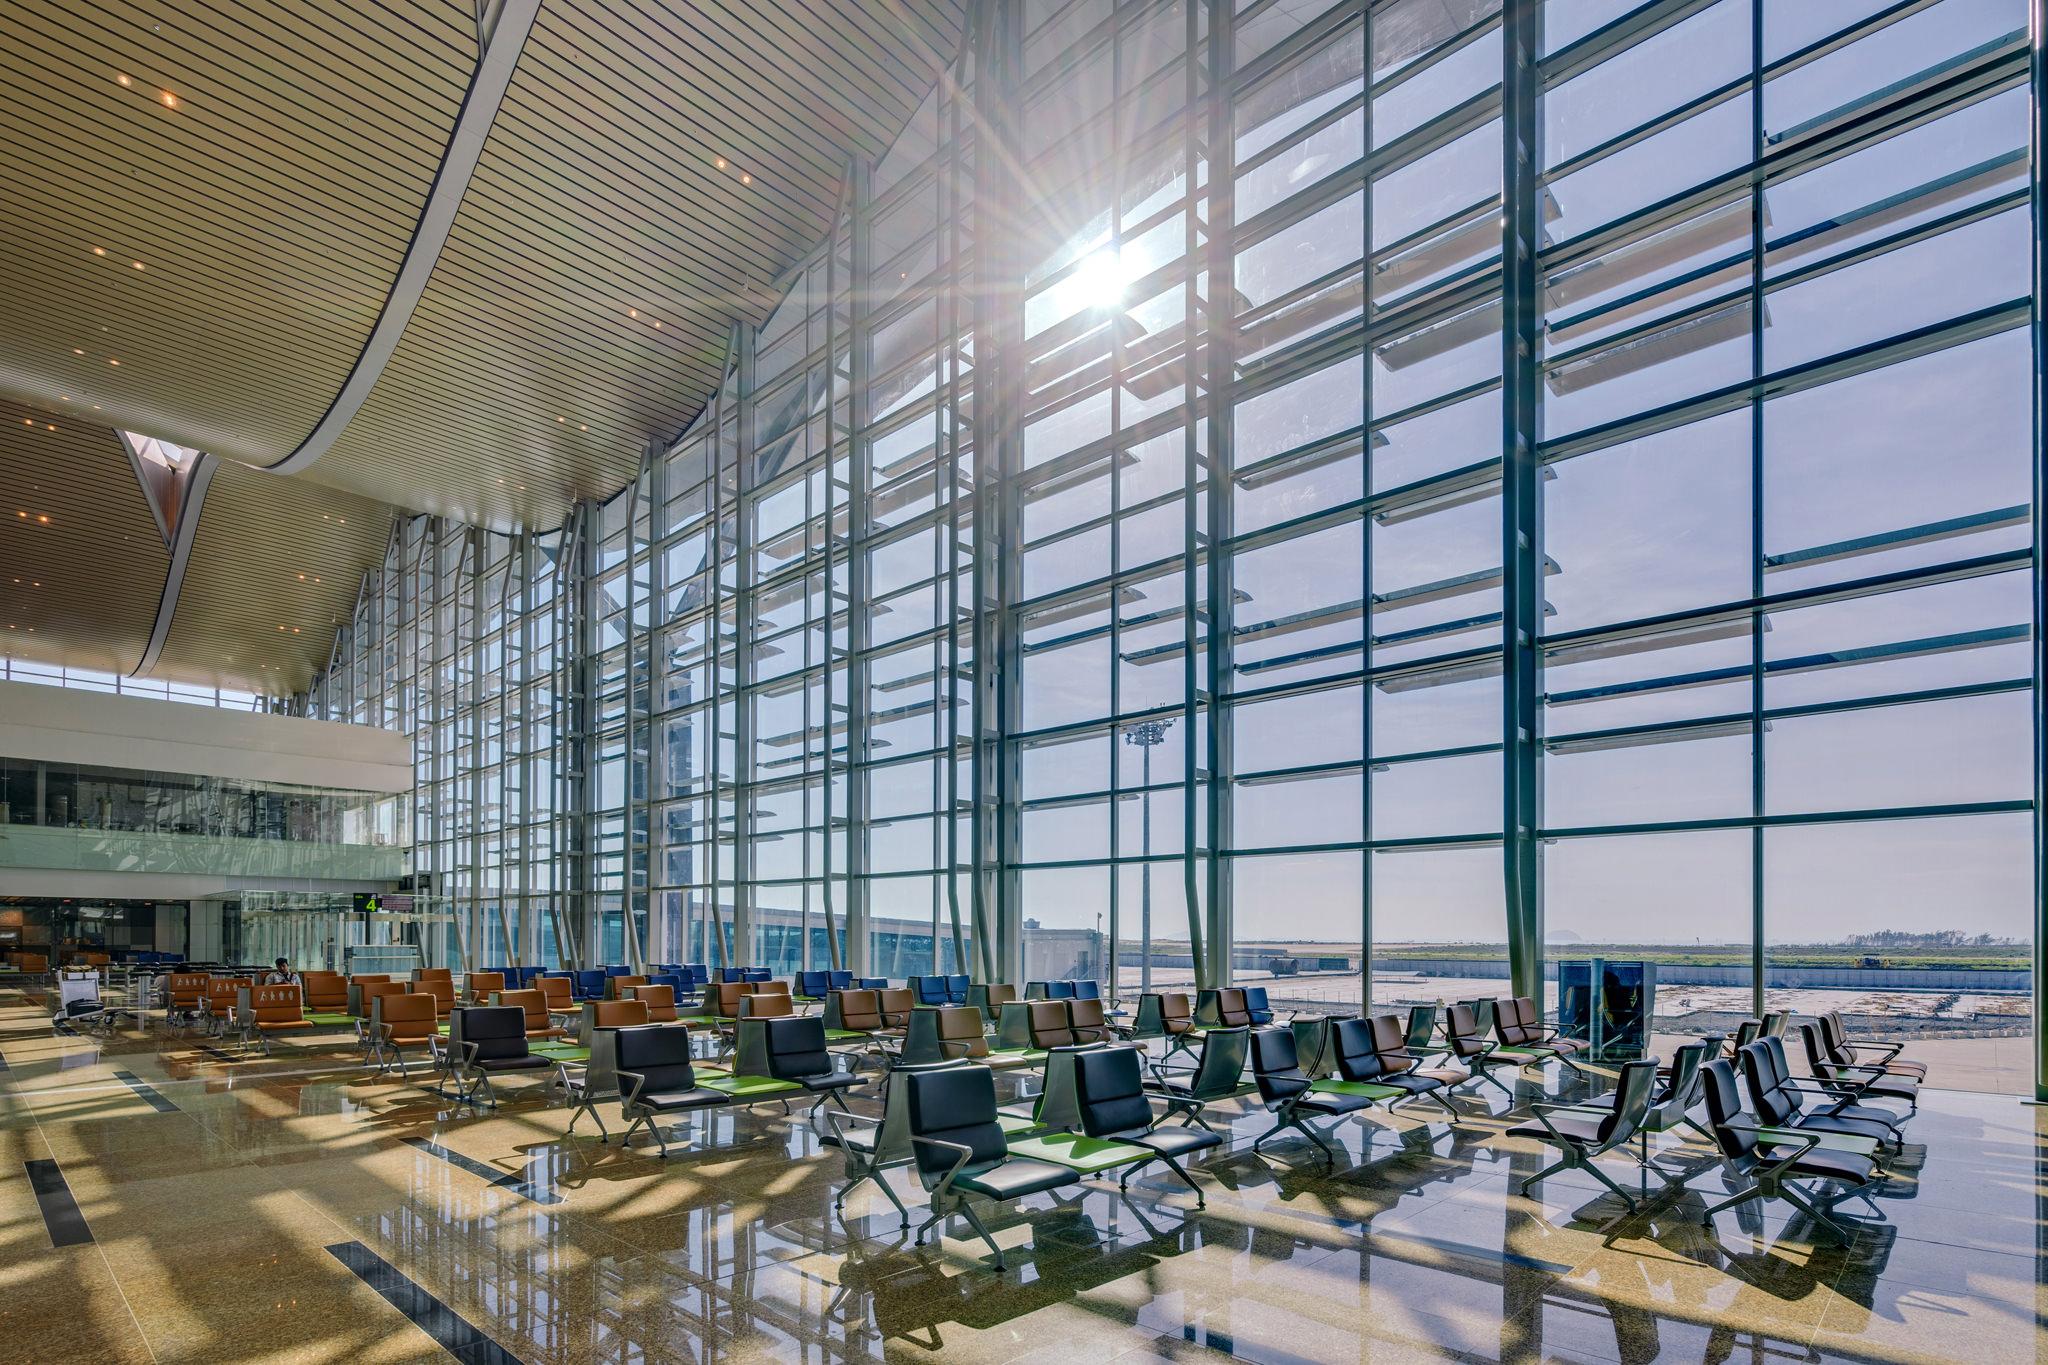 20180626 - Cam Ranh Airport - Architecture - 0178.jpg